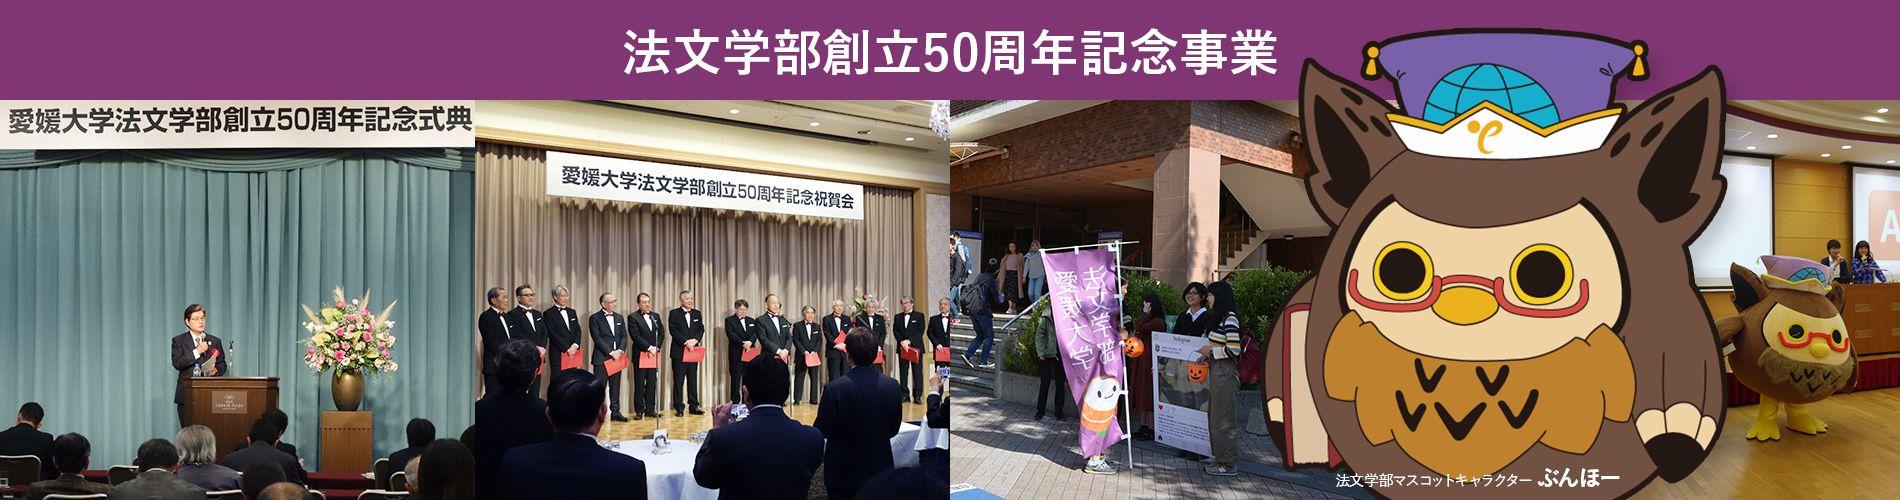 https://www.ll.ehime-u.ac.jp/about/anniversary50